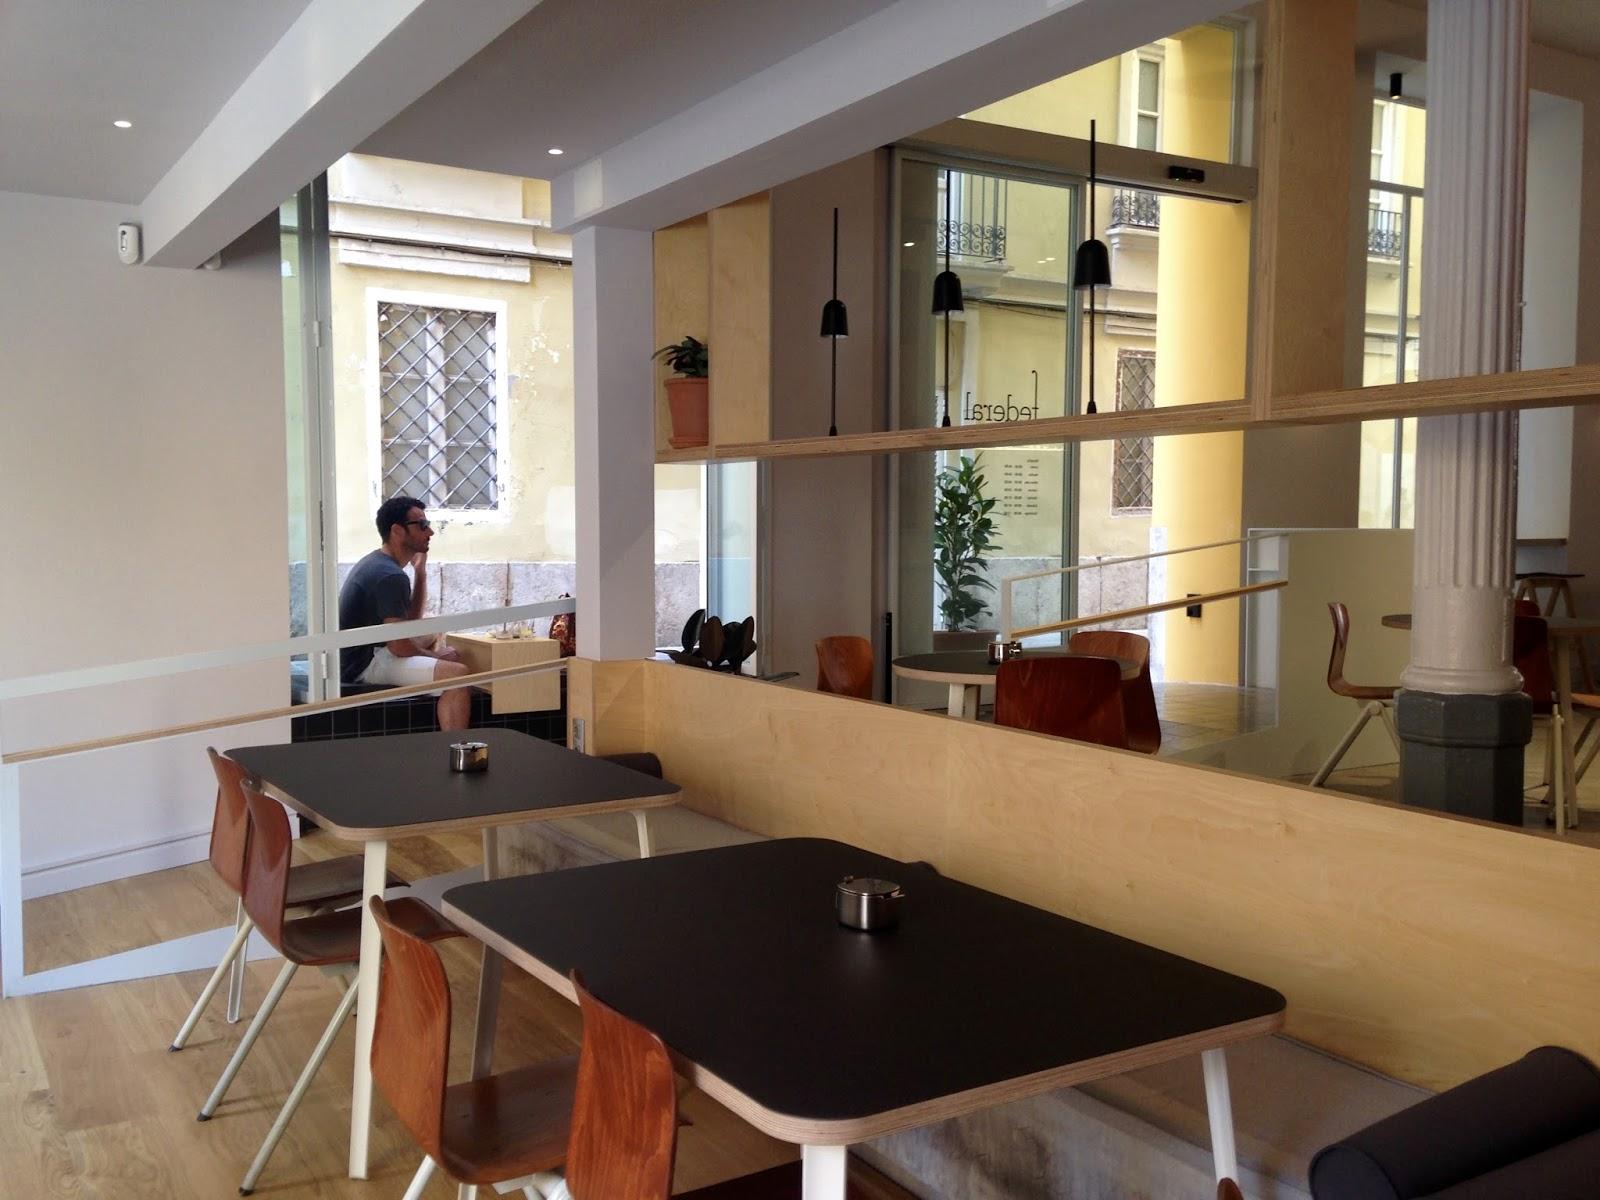 Federal Cafe: el modelo de cafetería australiana llega a Valencia ...